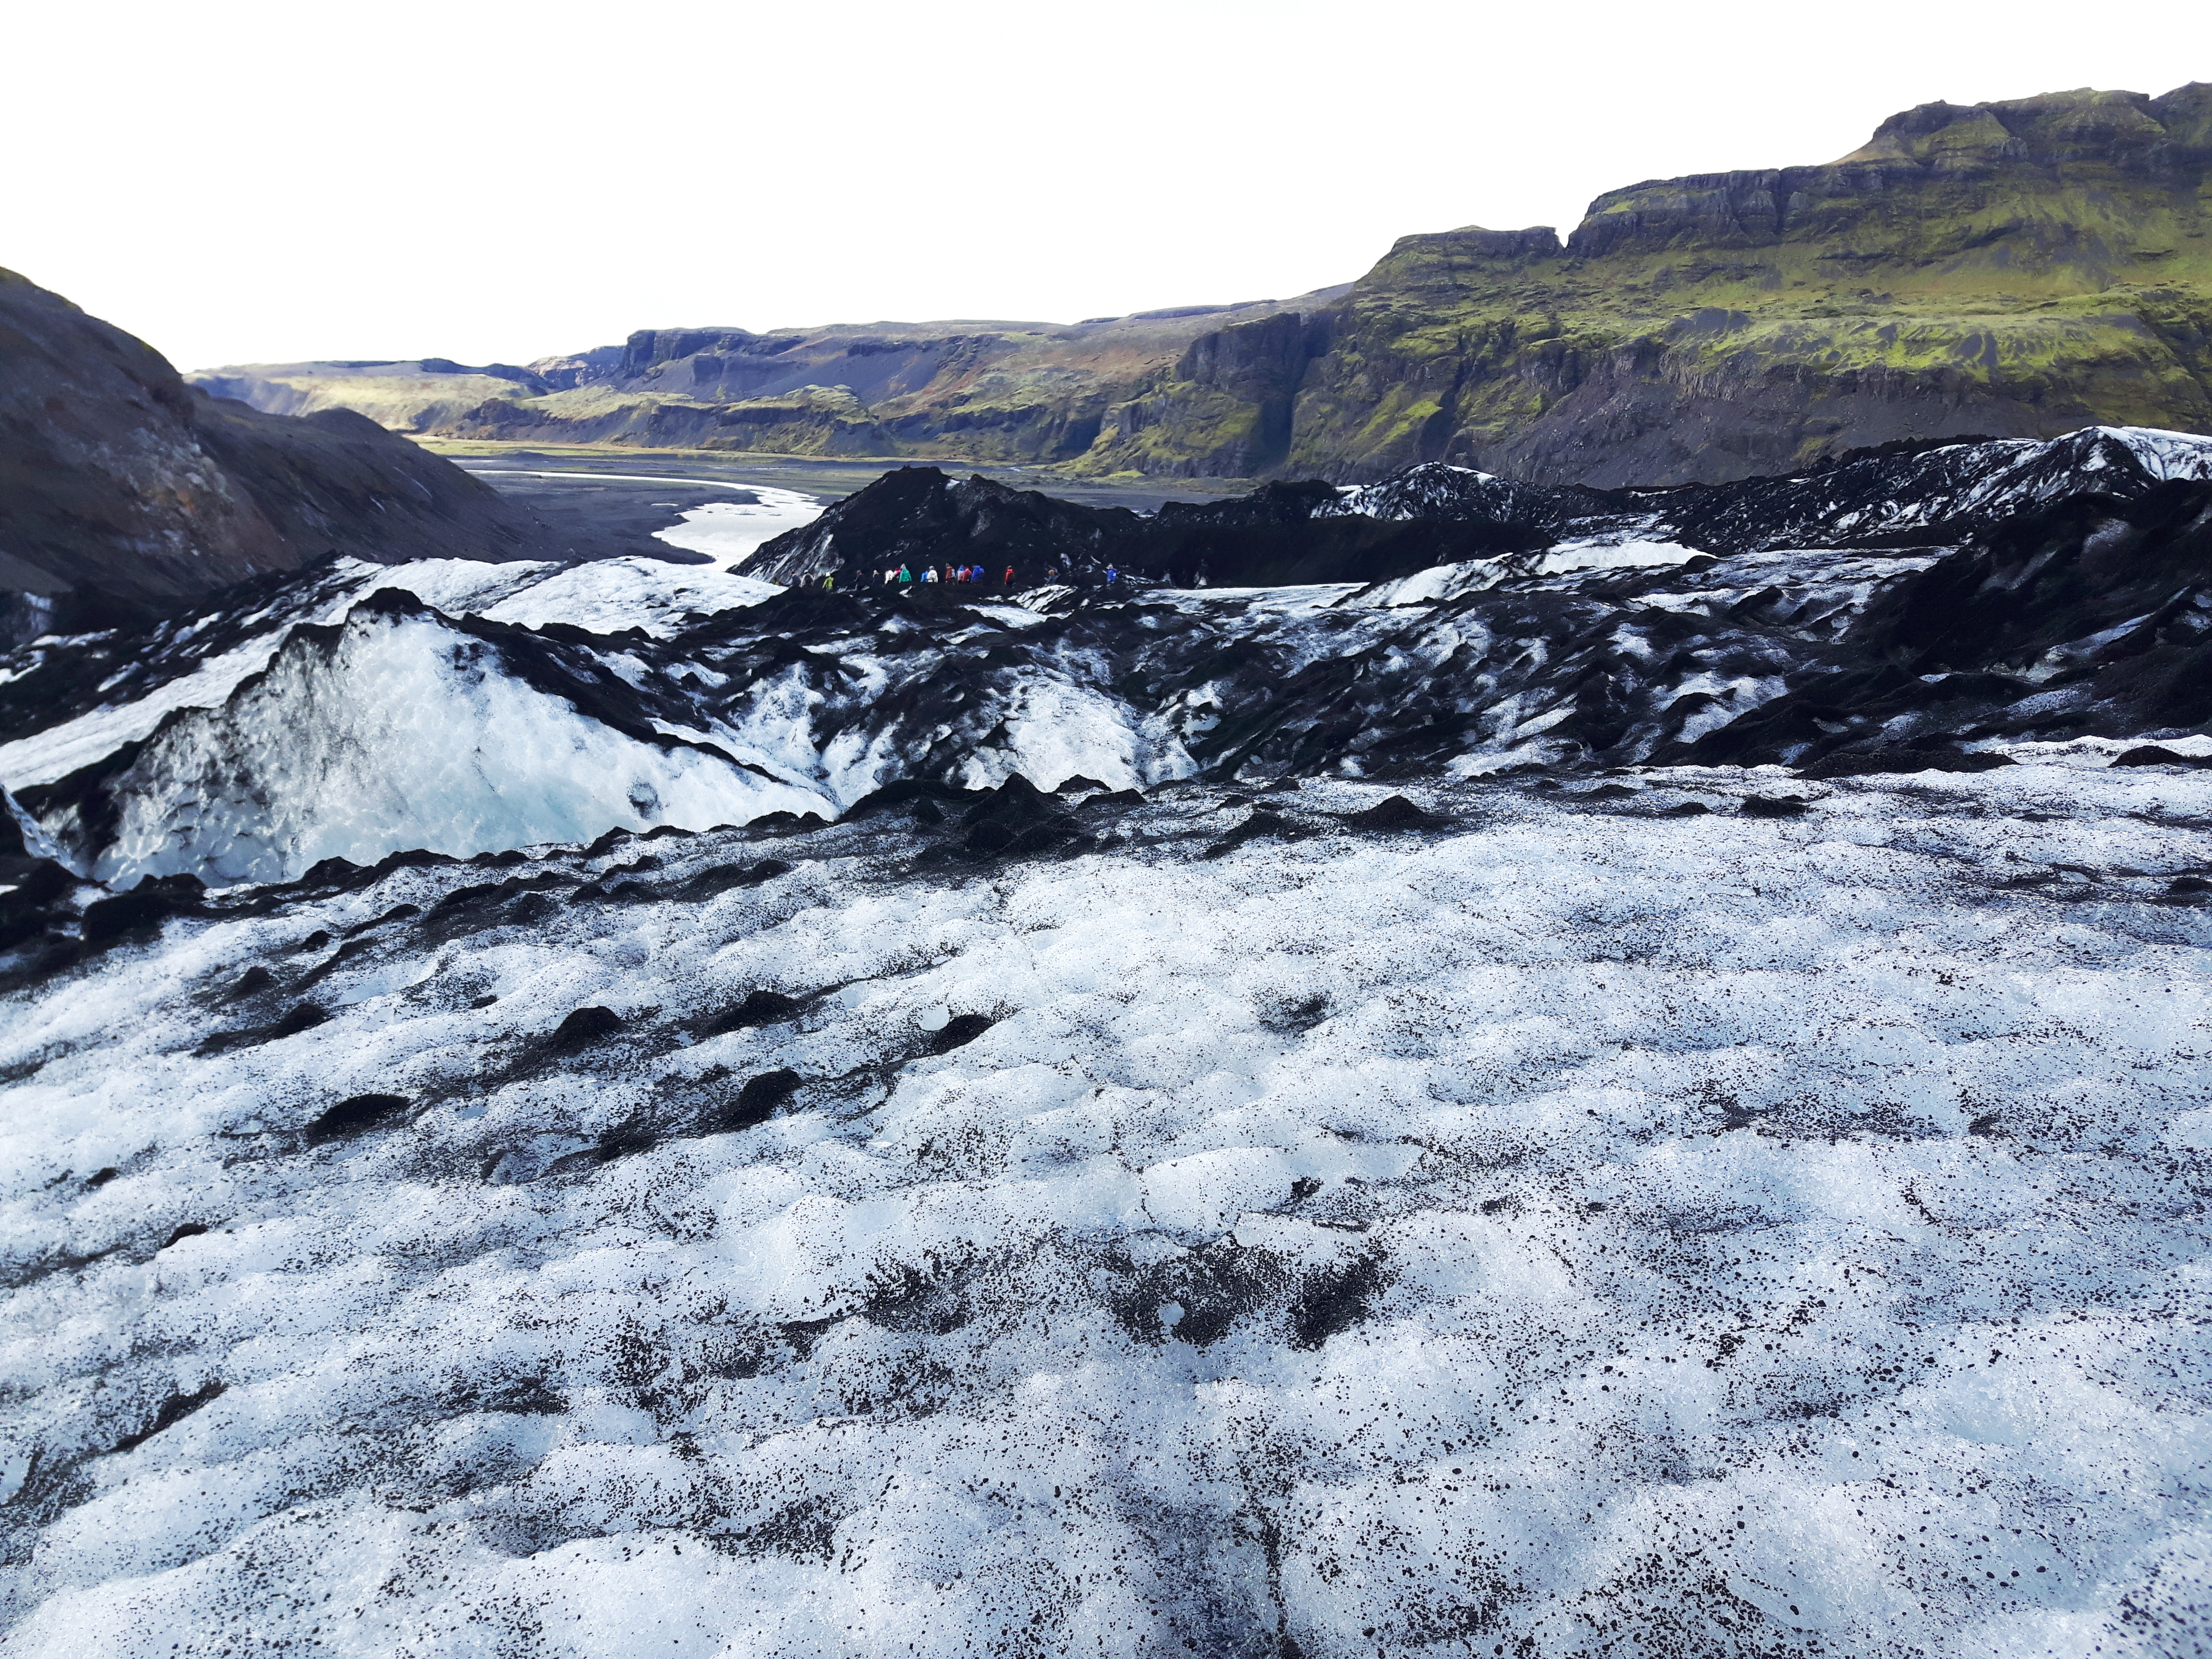 Sólheimajökull_Glacier_Iceland_Hiking